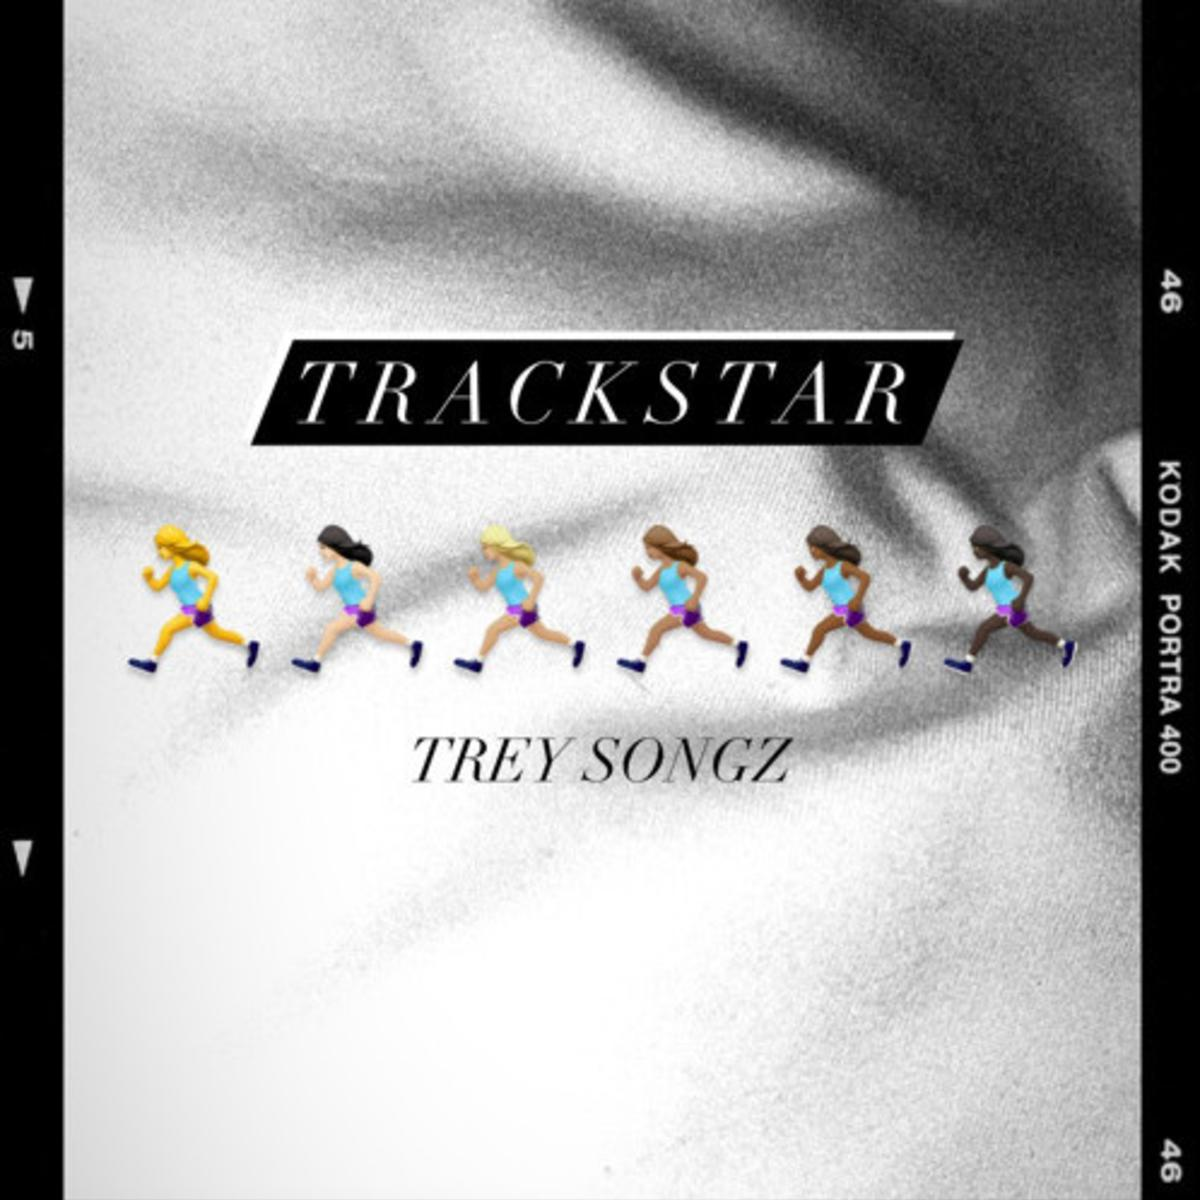 MP3: Trey Songz - Track Star (TriggaMix)